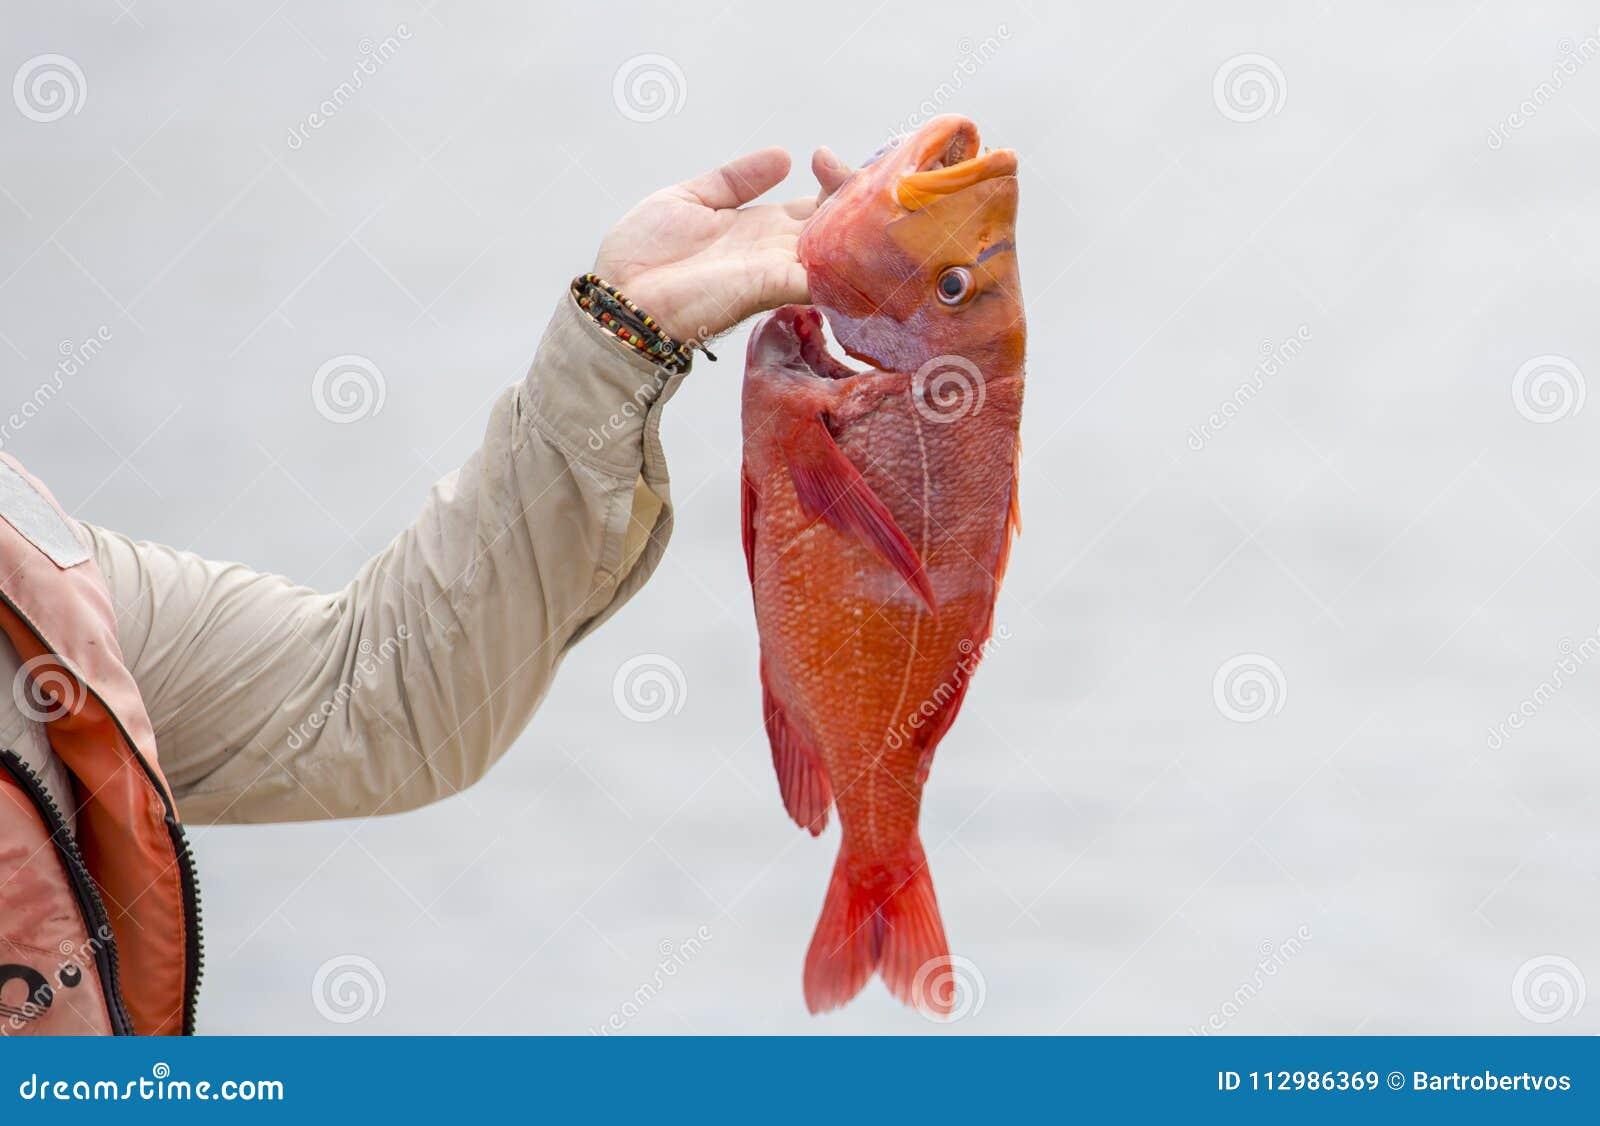 Fisherman shows fresh caught fish